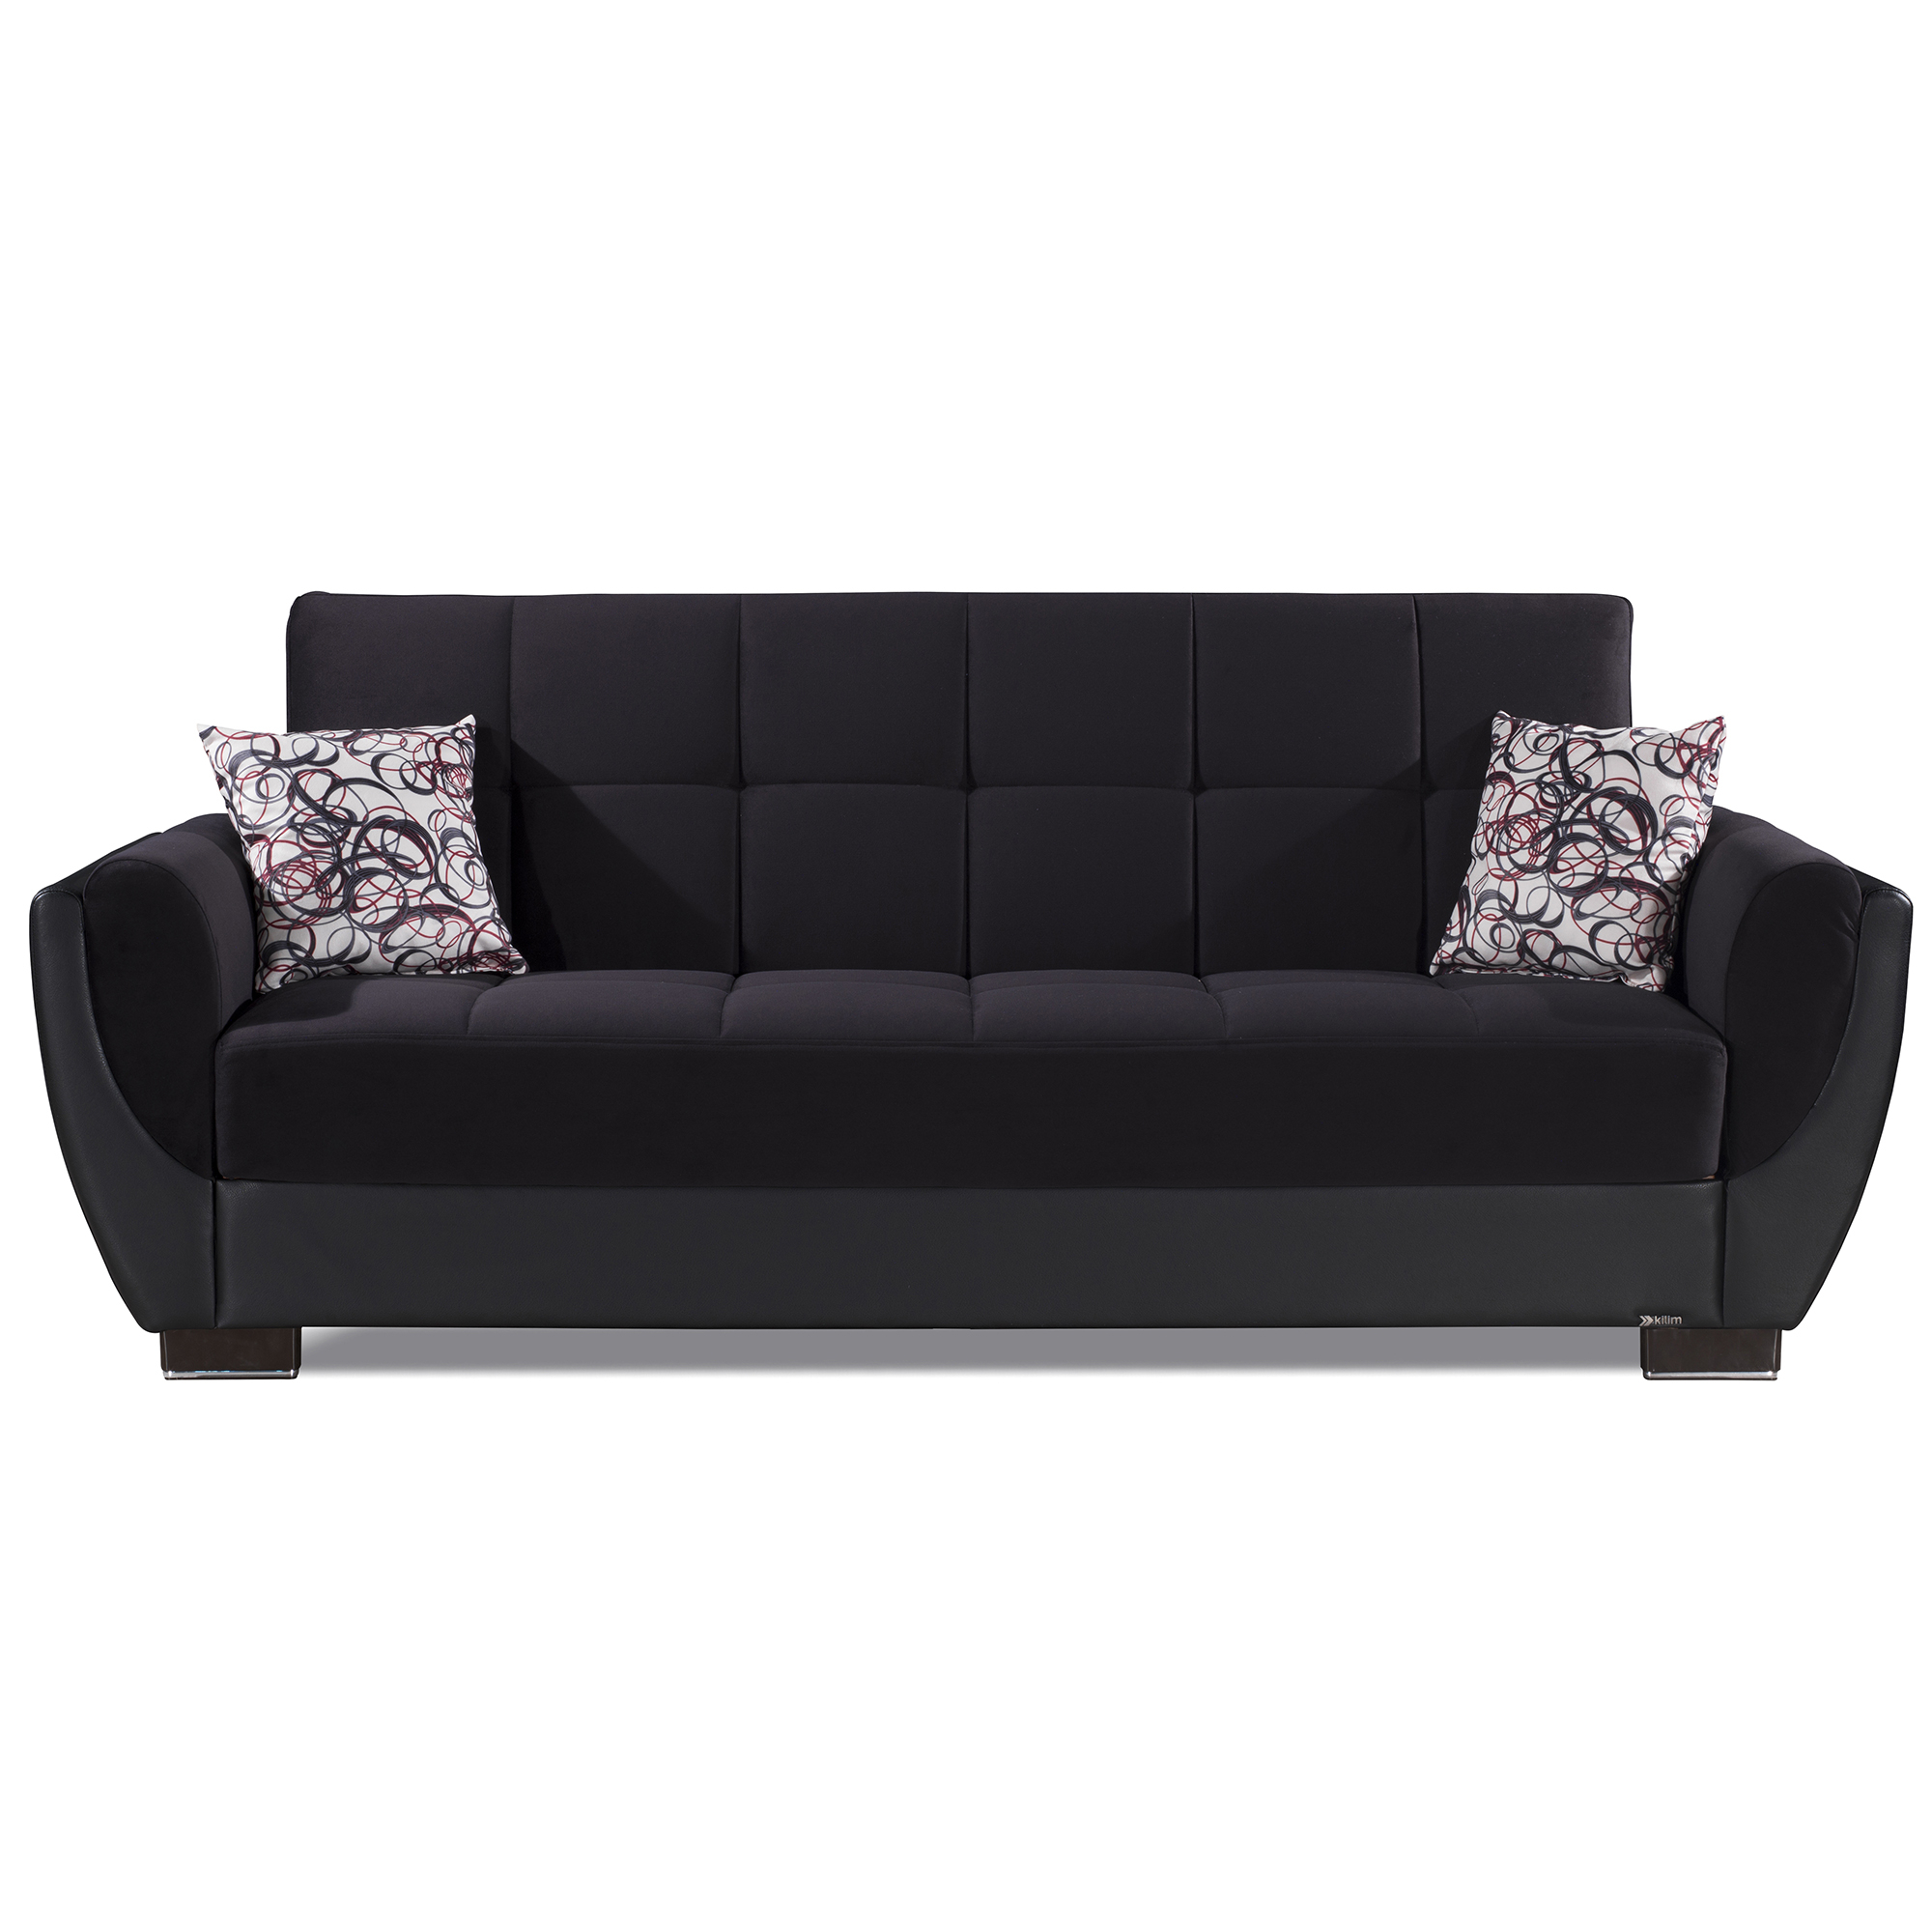 Ottomanson Armada Air Fabric Upholstery Sleeper Sofa Bed Regarding Hartford Storage Sectional Futon Sofas (View 8 of 15)